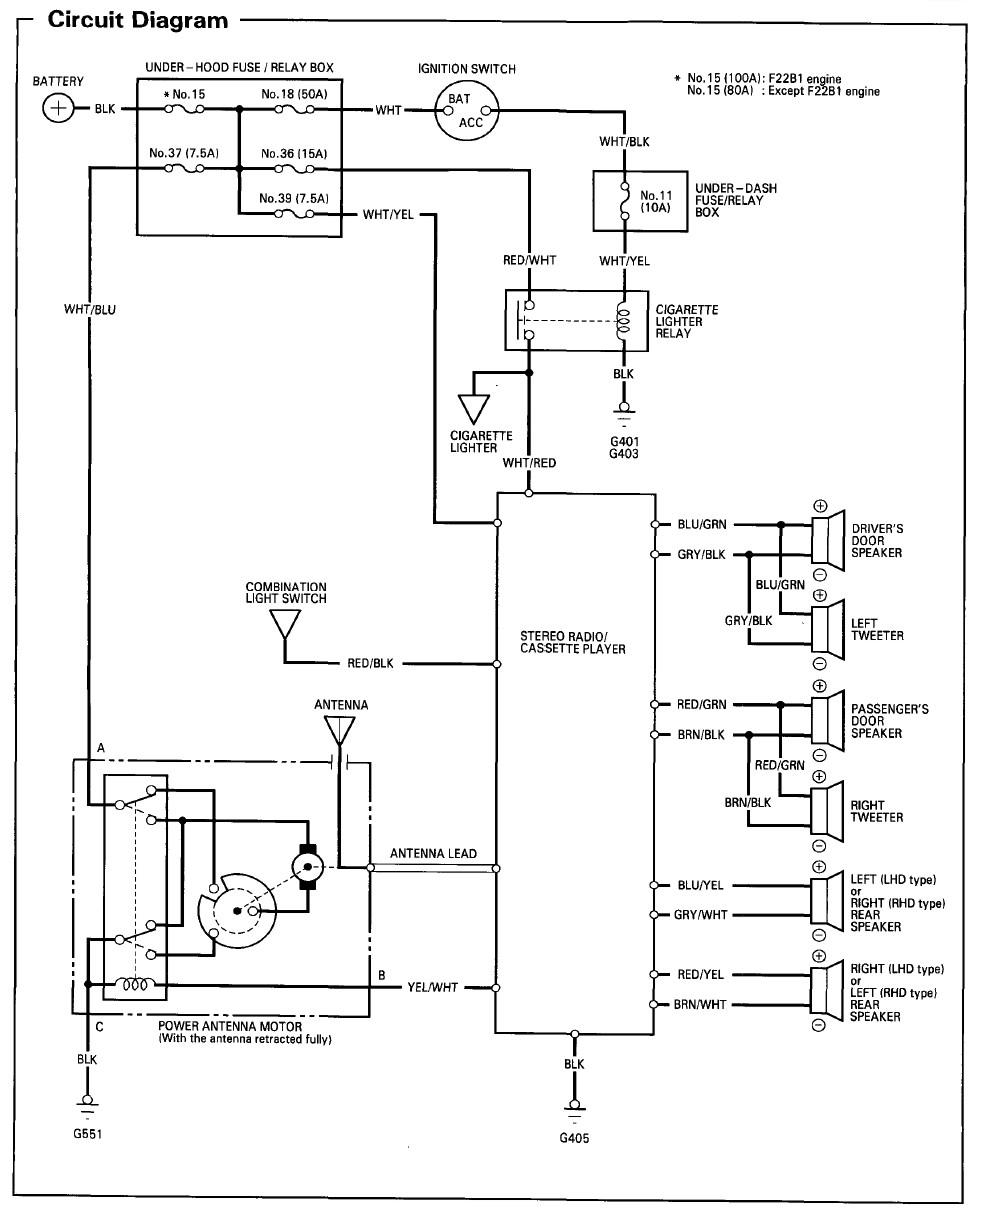 1997 Honda Accord Stereo Wiring Wiring Diagram Data 99 Accord Wire Diagram 02 Honda Accord Wiring